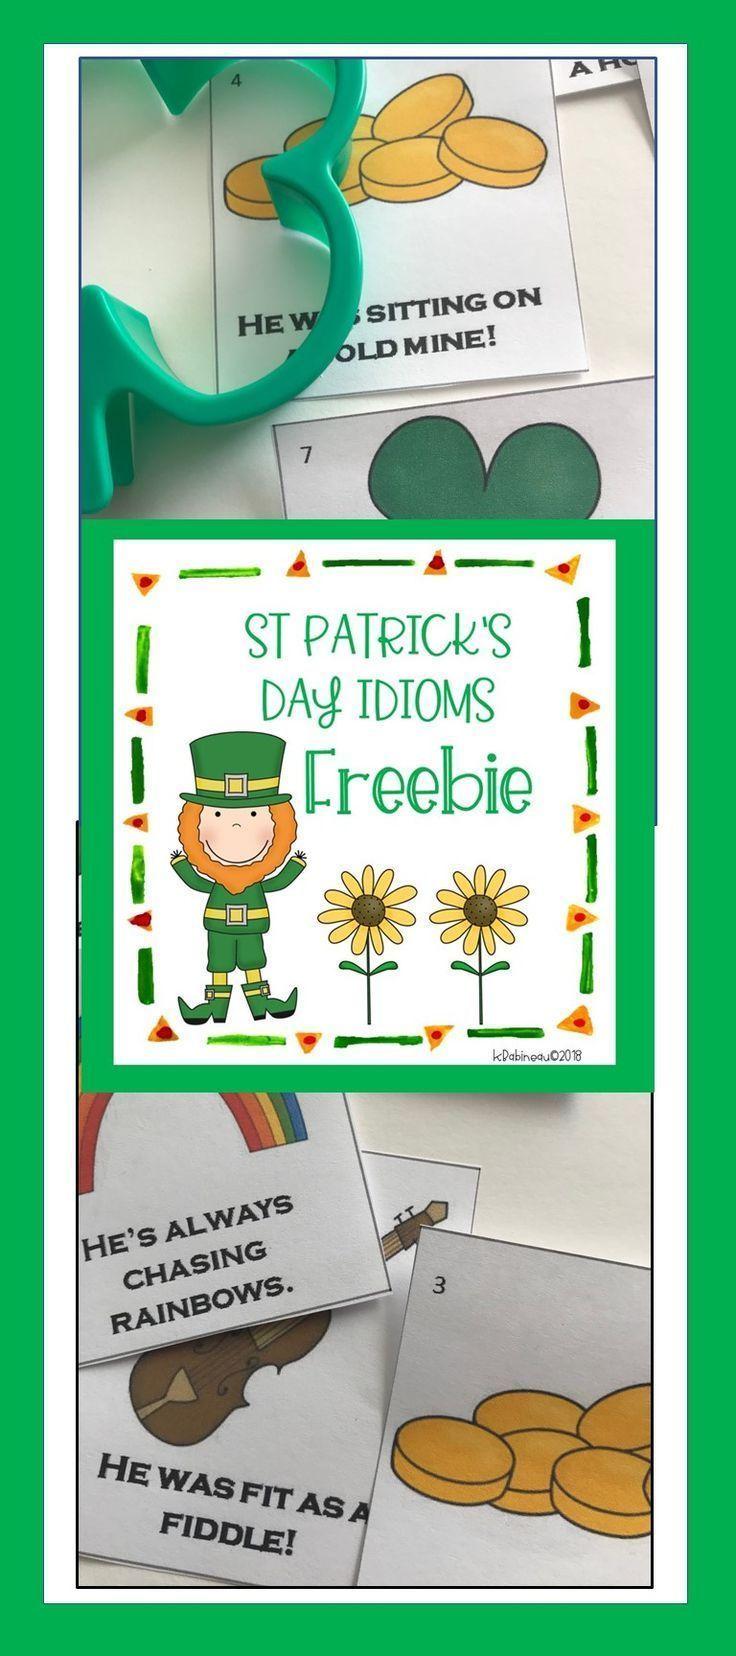 St. Patrick's Day Idioms in 2020 Idioms, Figurative